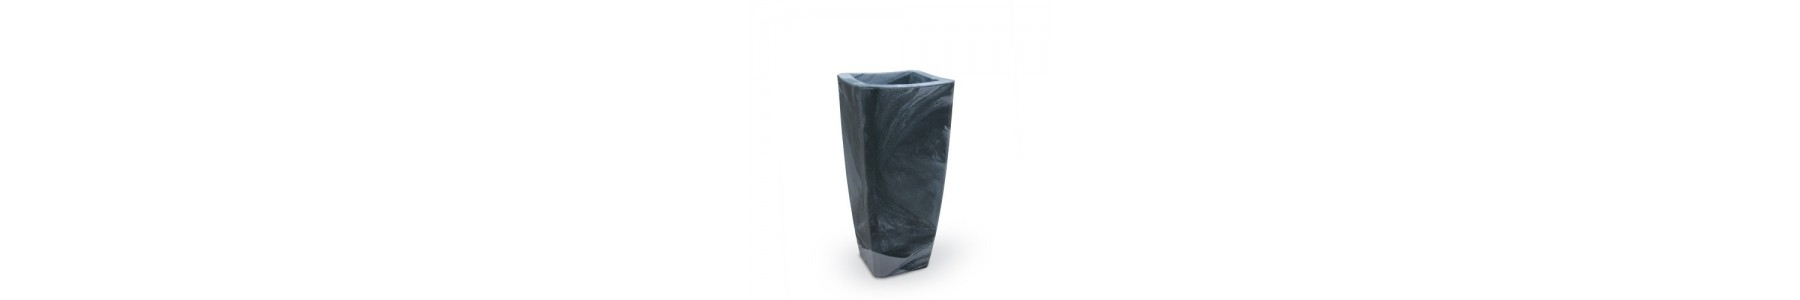 Donice - imitacja kamienia